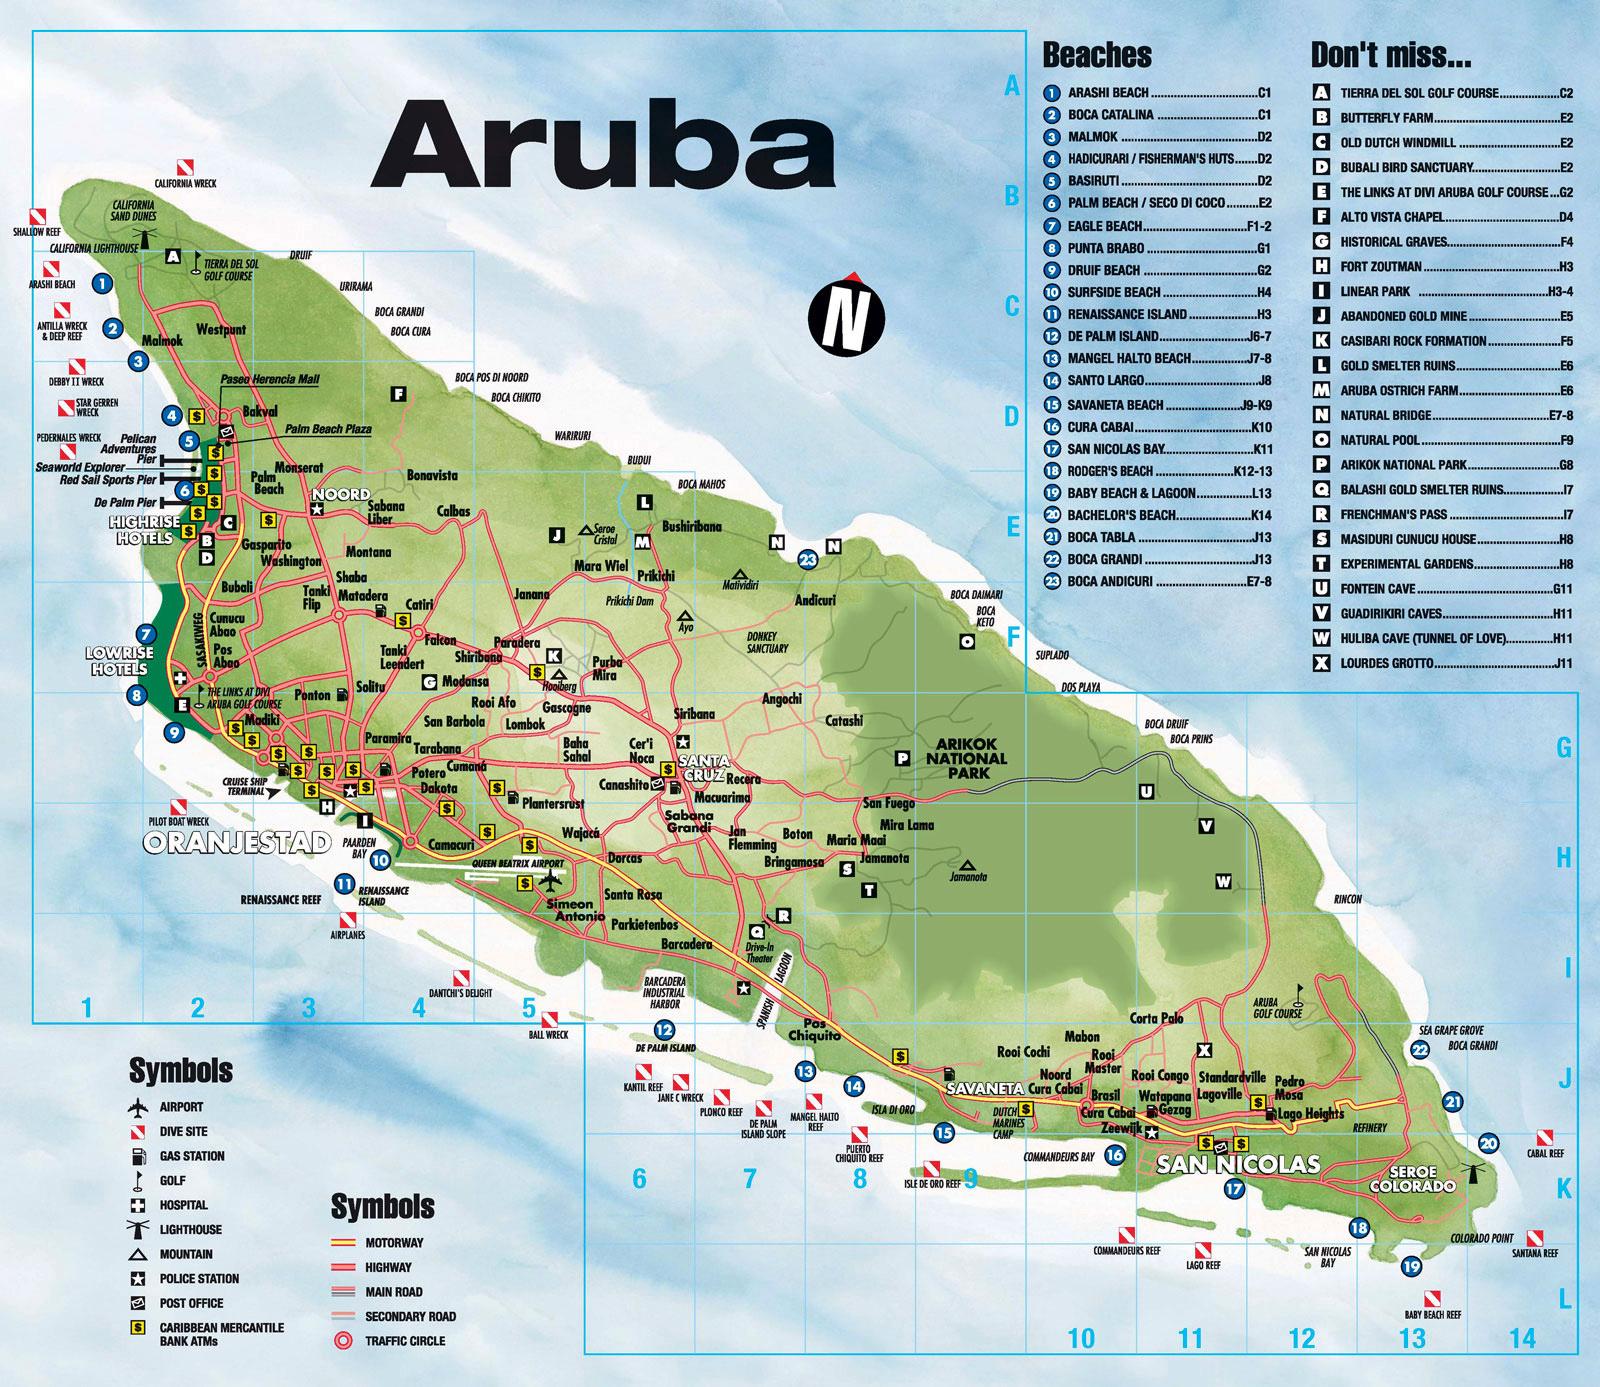 Shipping to Aruba